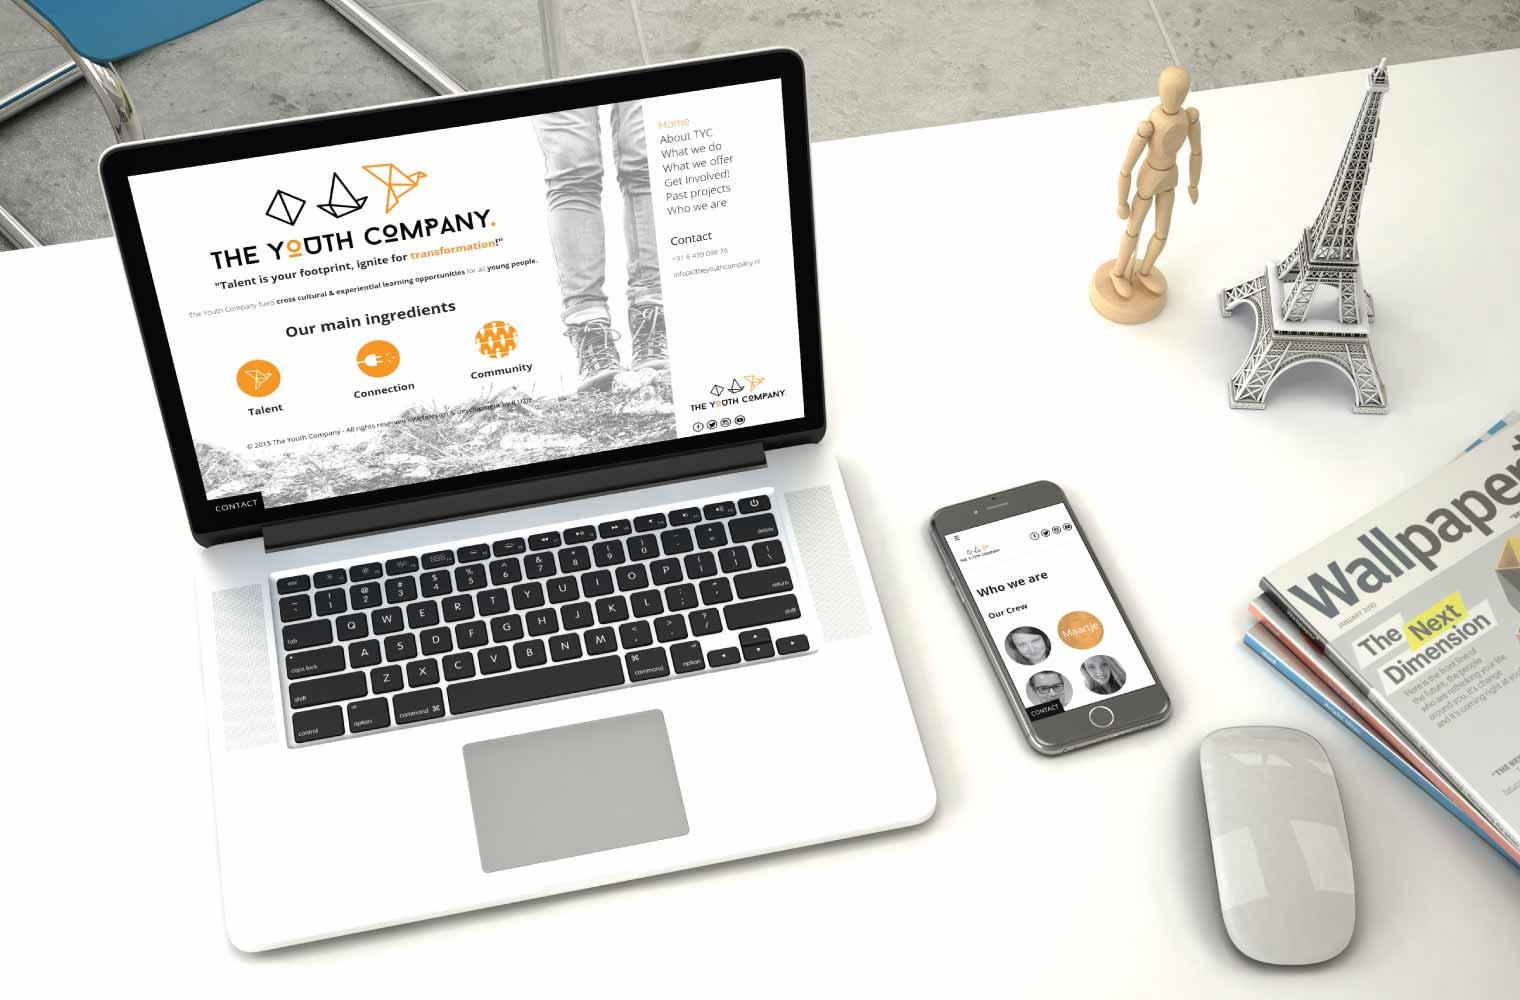 Website The Youth Company - desktop en mobile